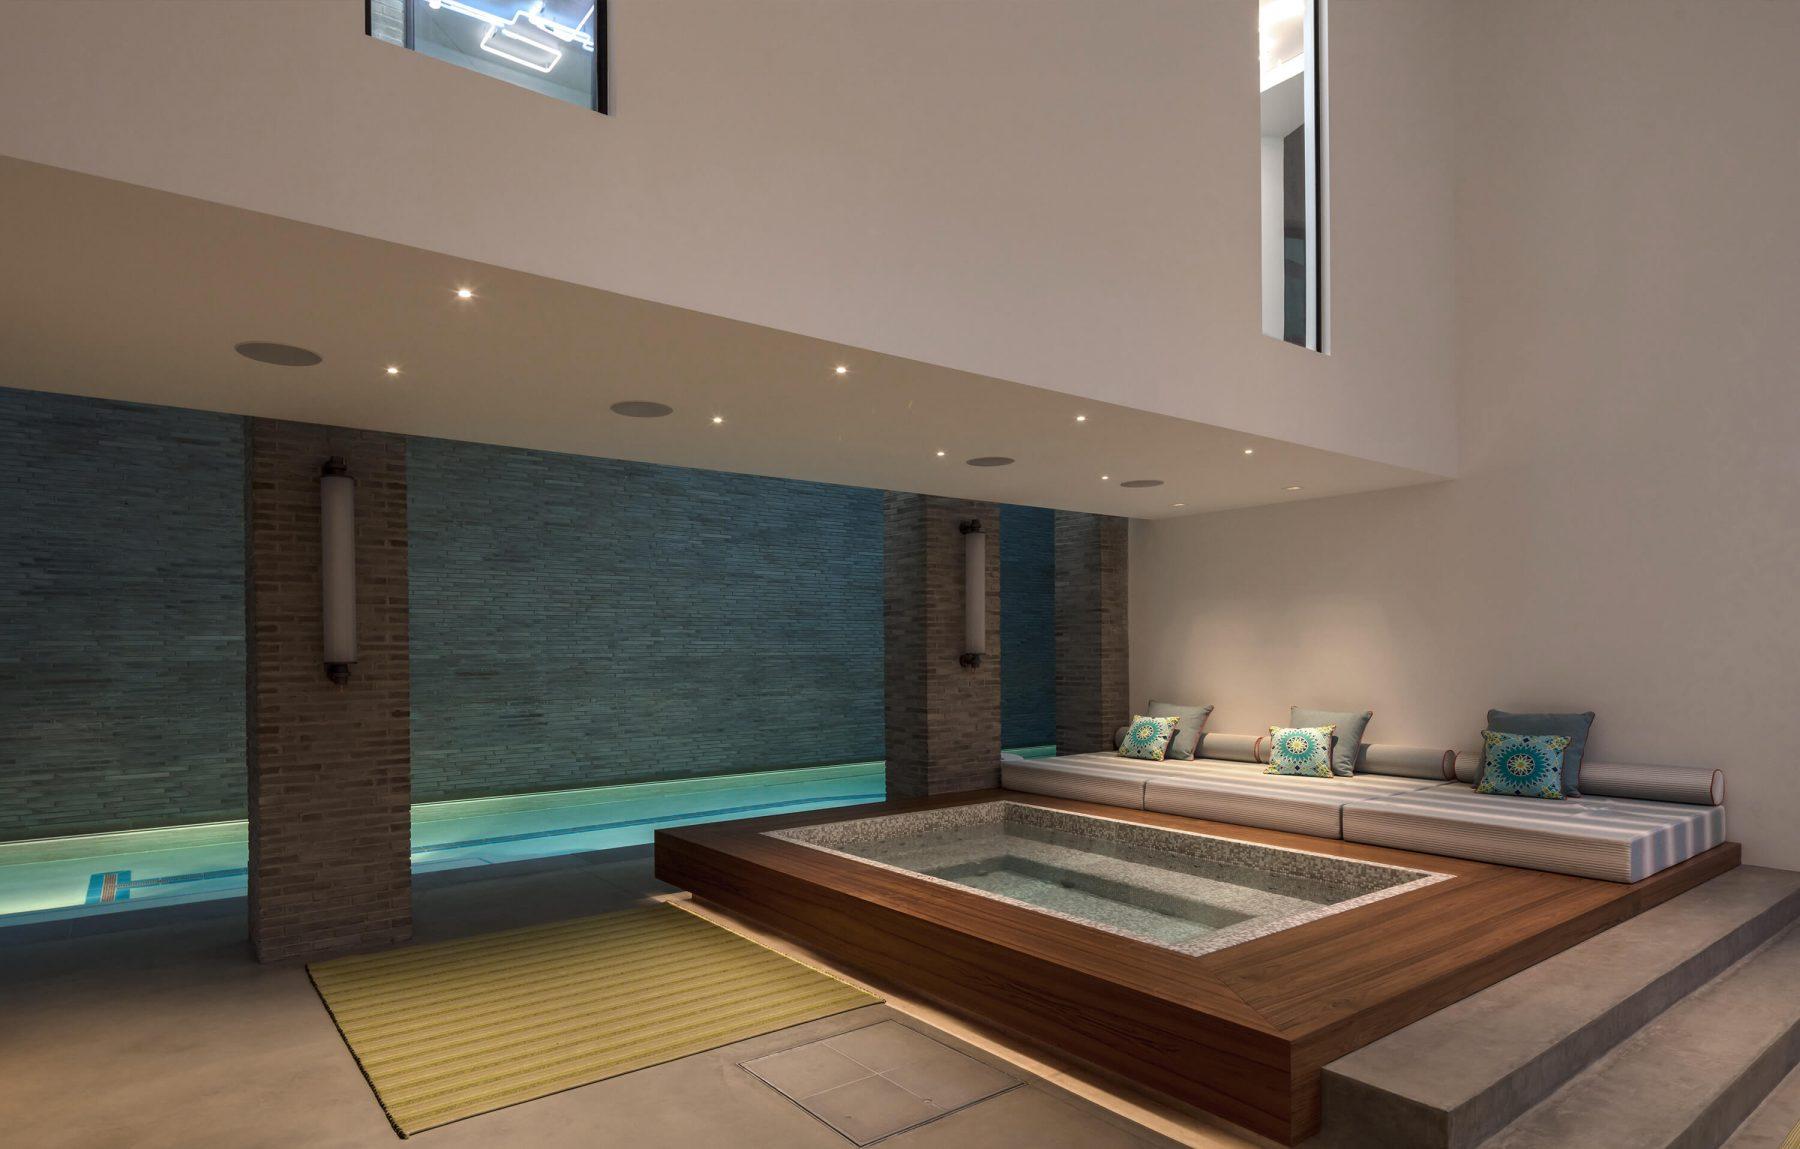 The Grand Luxury Basement Wilkinson Beven Interior Design